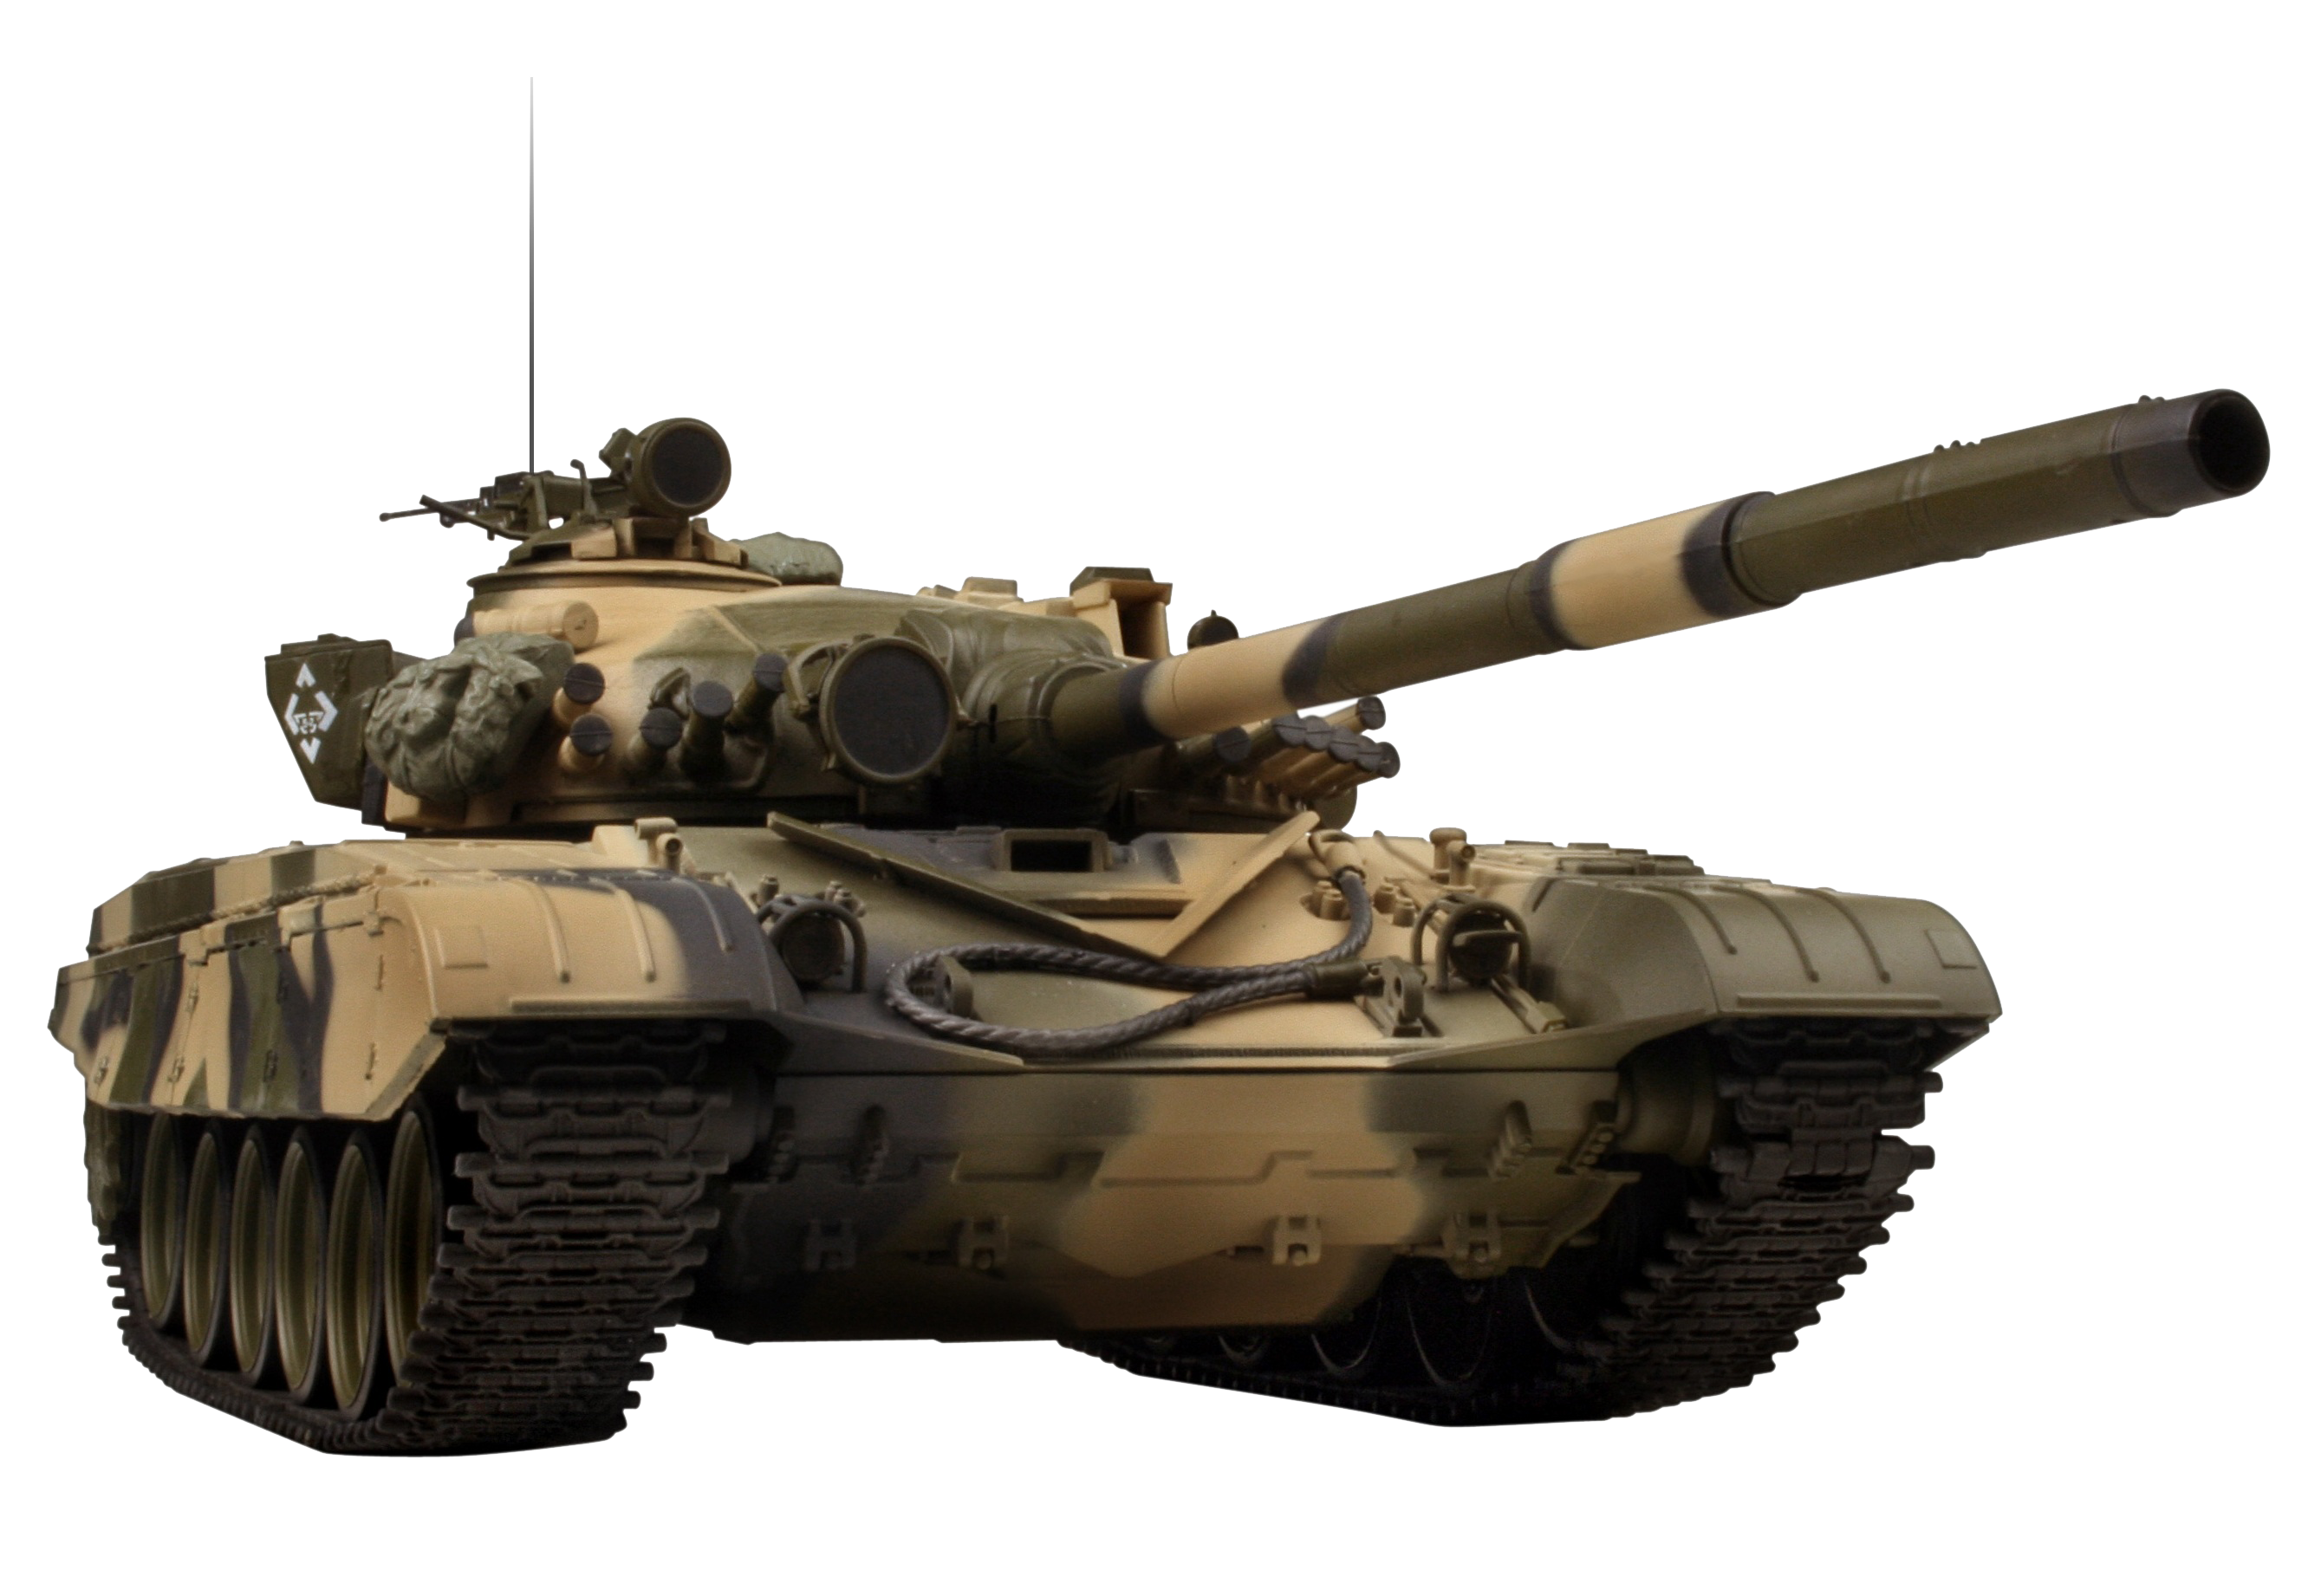 Tank Png File - Tank, Transparent background PNG HD thumbnail